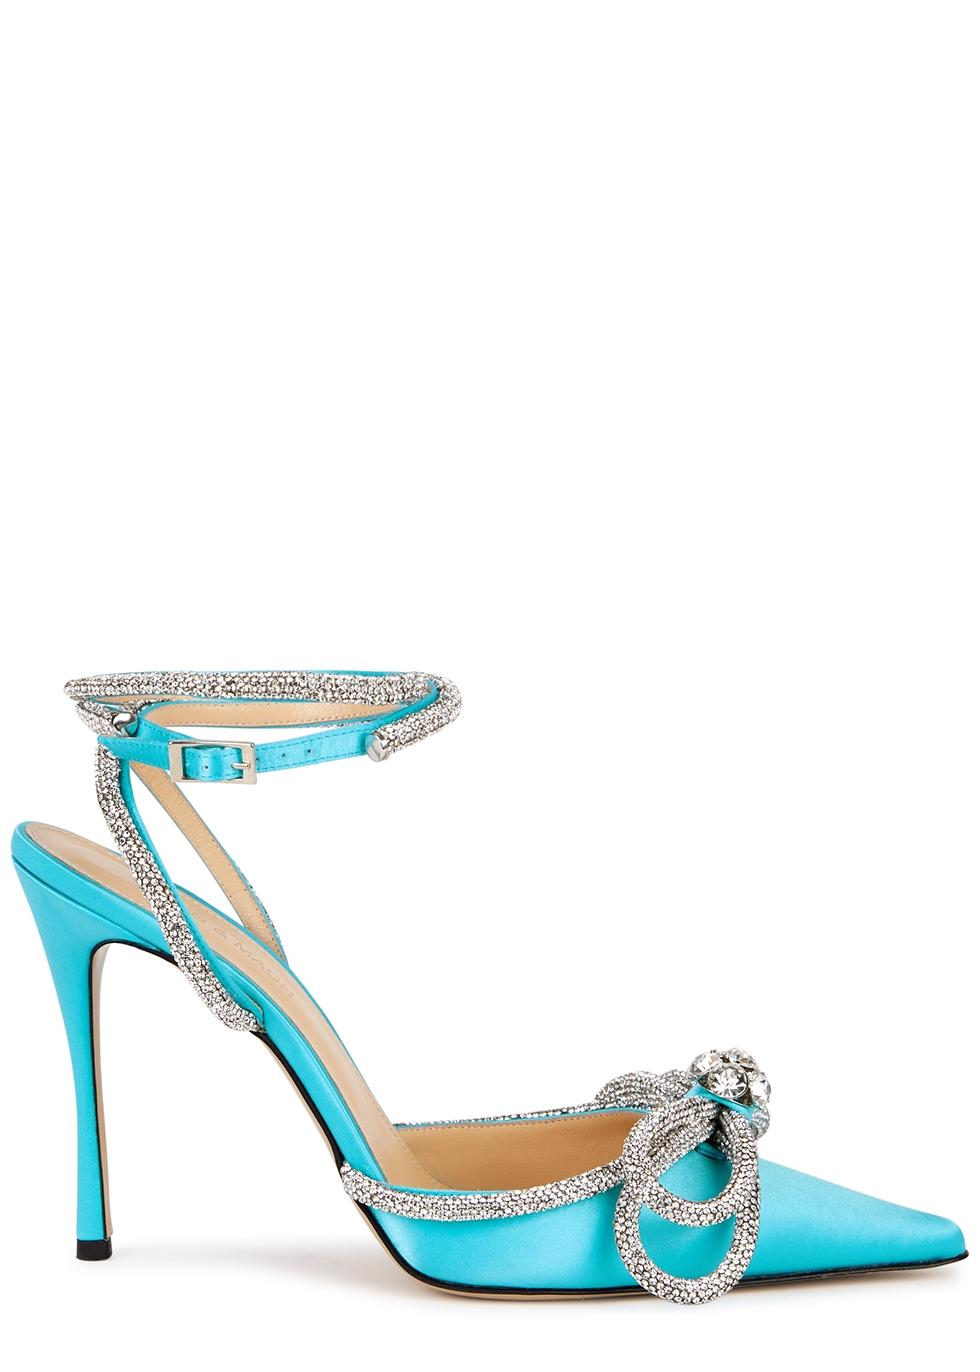 110 turquoise crystal-embellished satin pumps